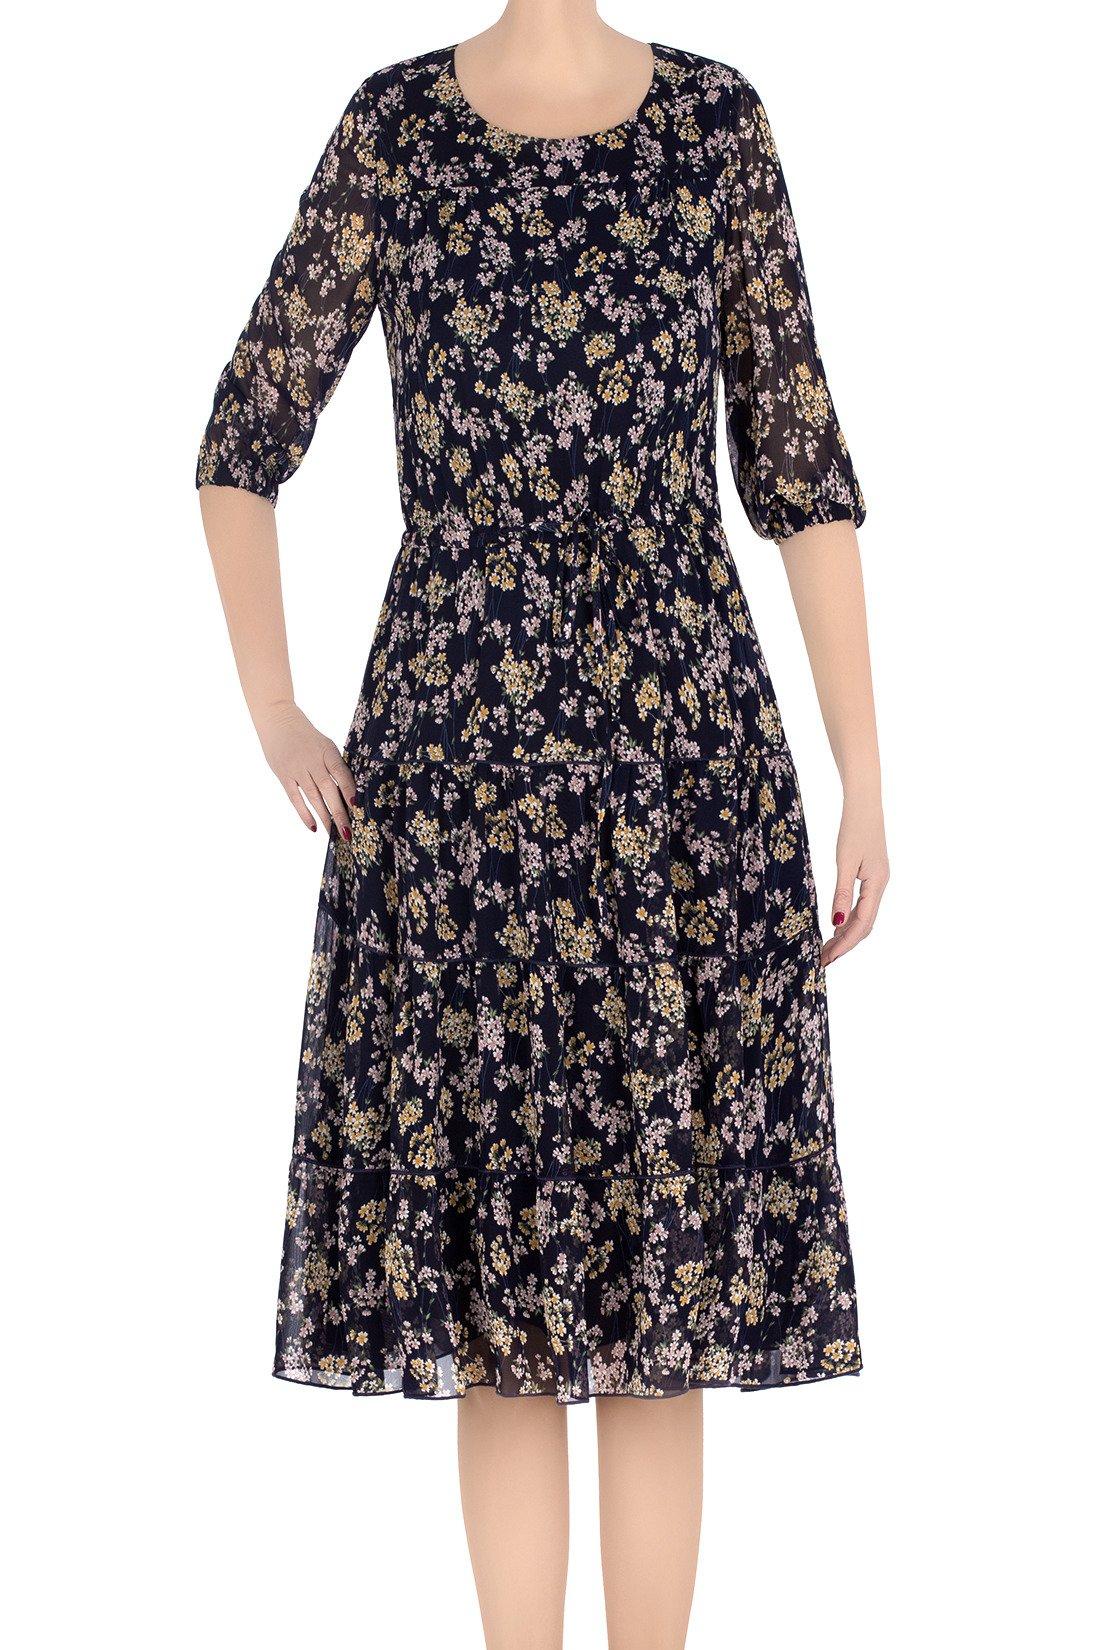 c96d052d1d Modna sukienka damska Malika granatowa w żółto-różowe kwiaty 3318 ...